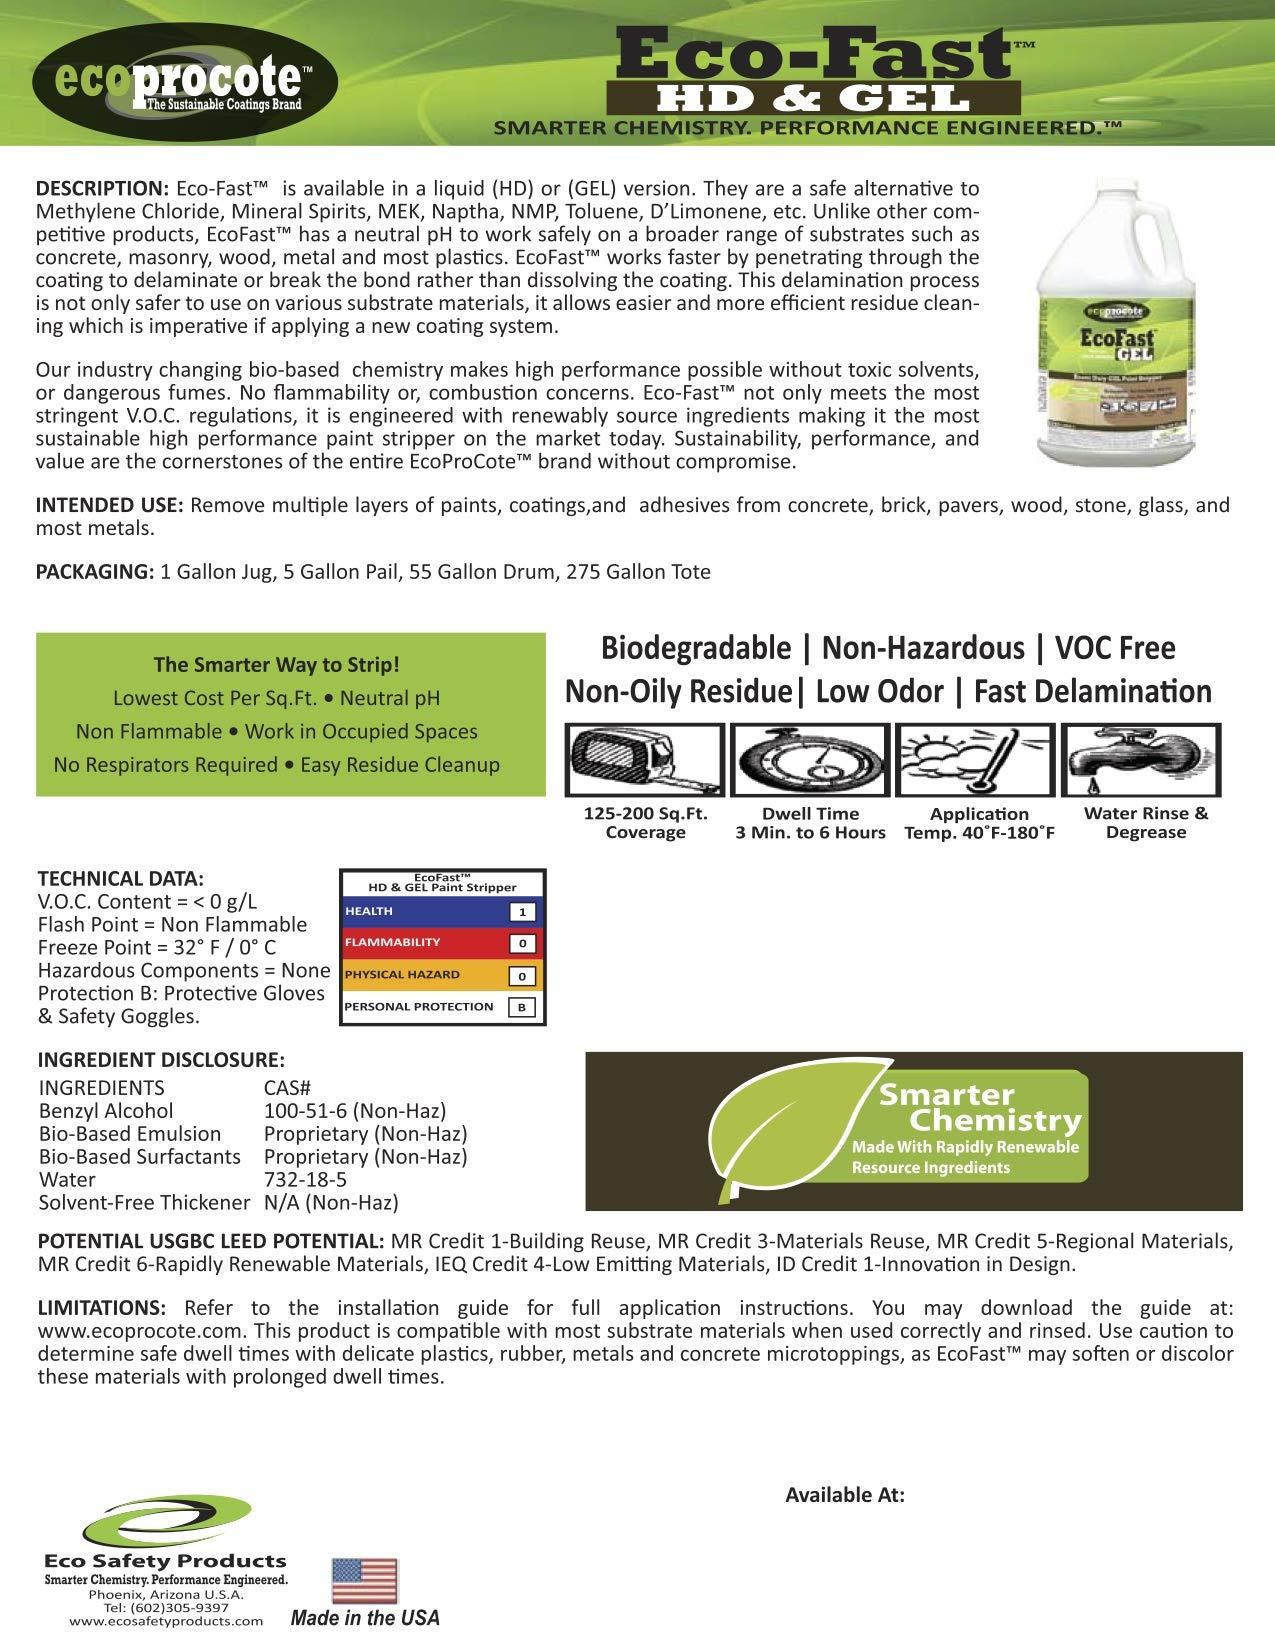 EcoFast EFHD-100G-1 GEL Paint Stripper (1 Gallon)